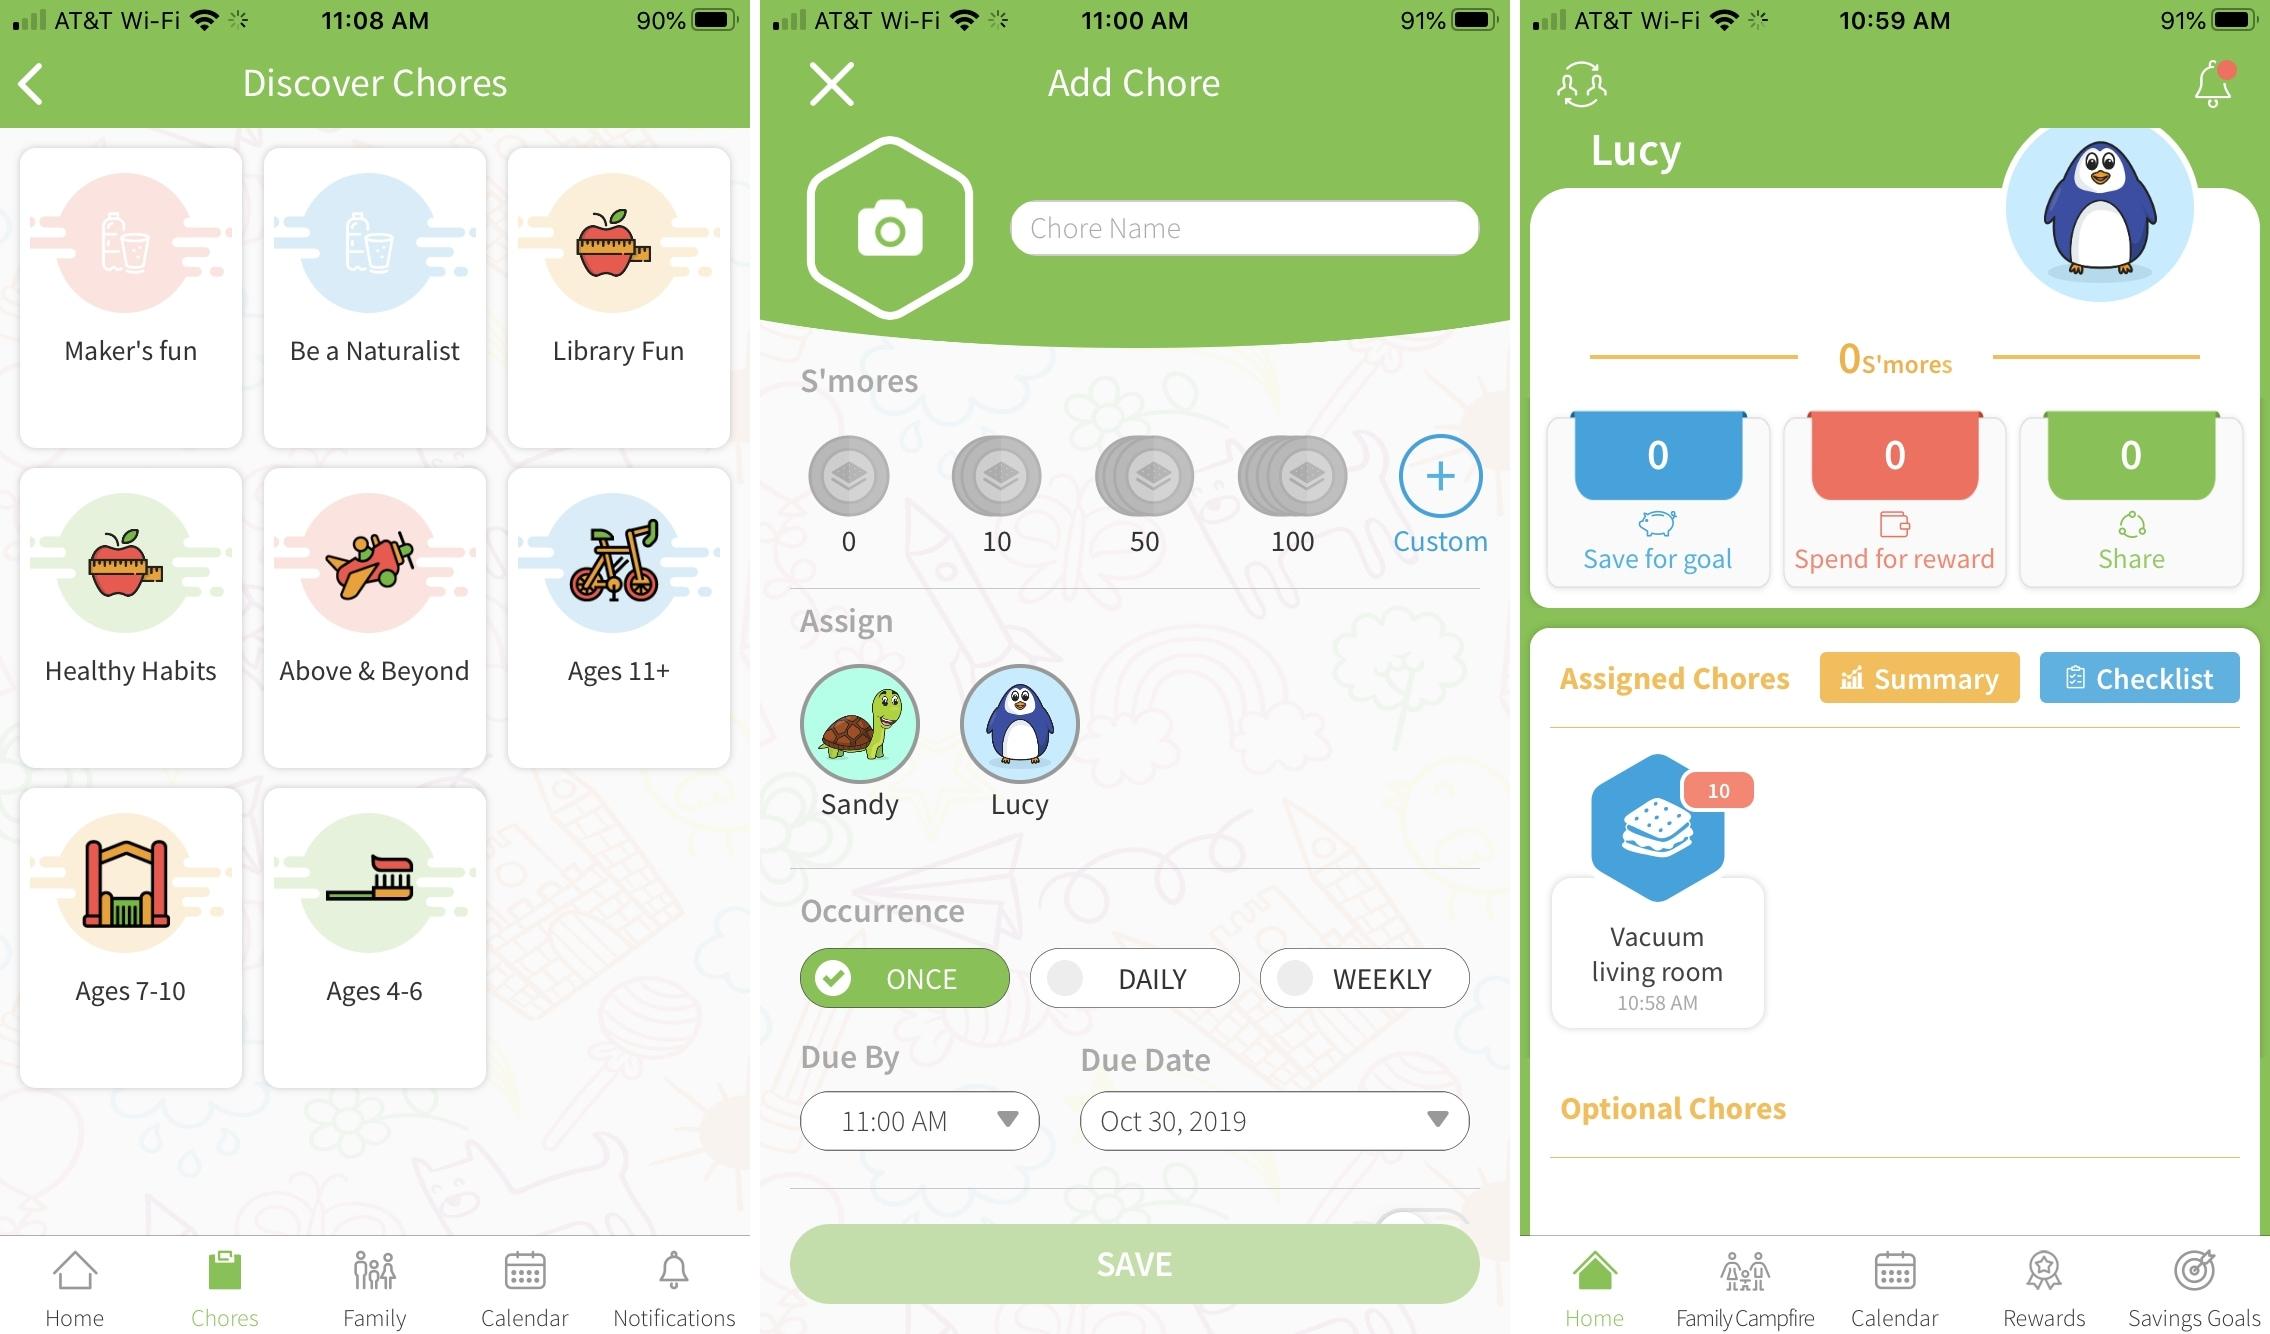 SmoresUp iPhone chore app